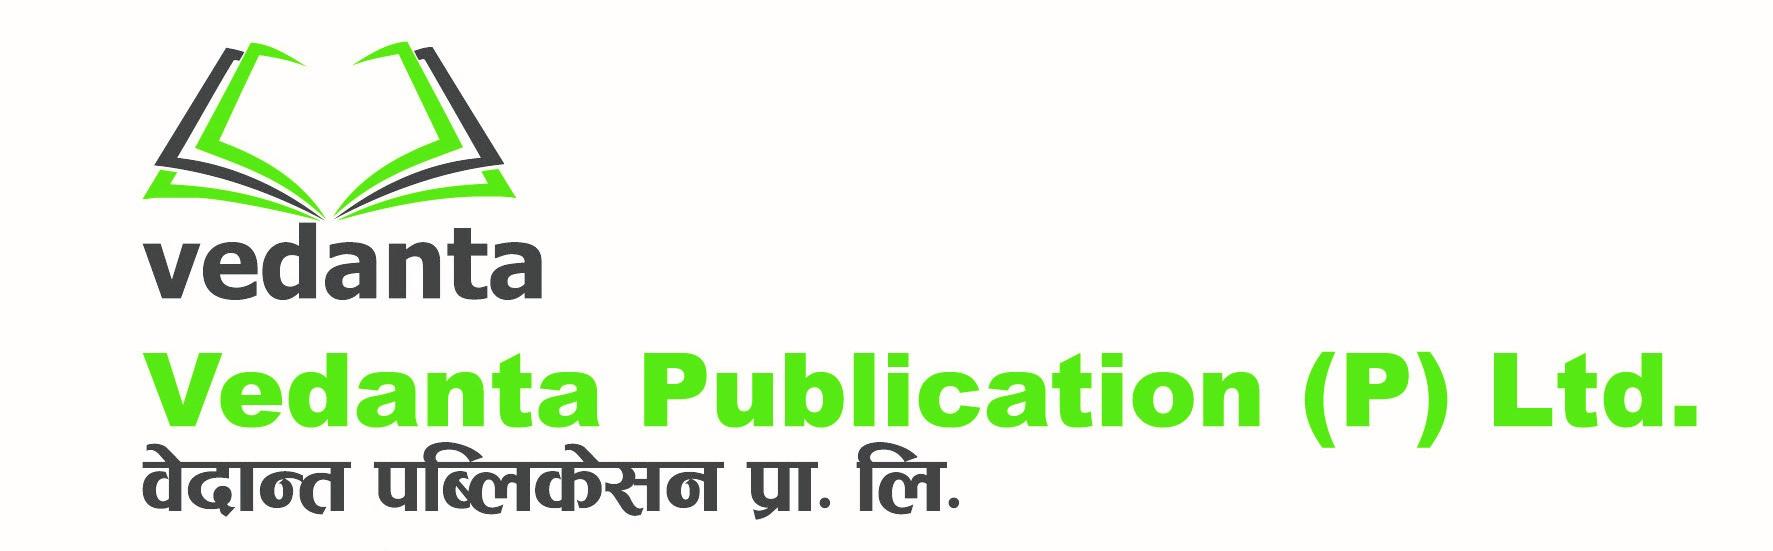 Vedanta Publication Logo